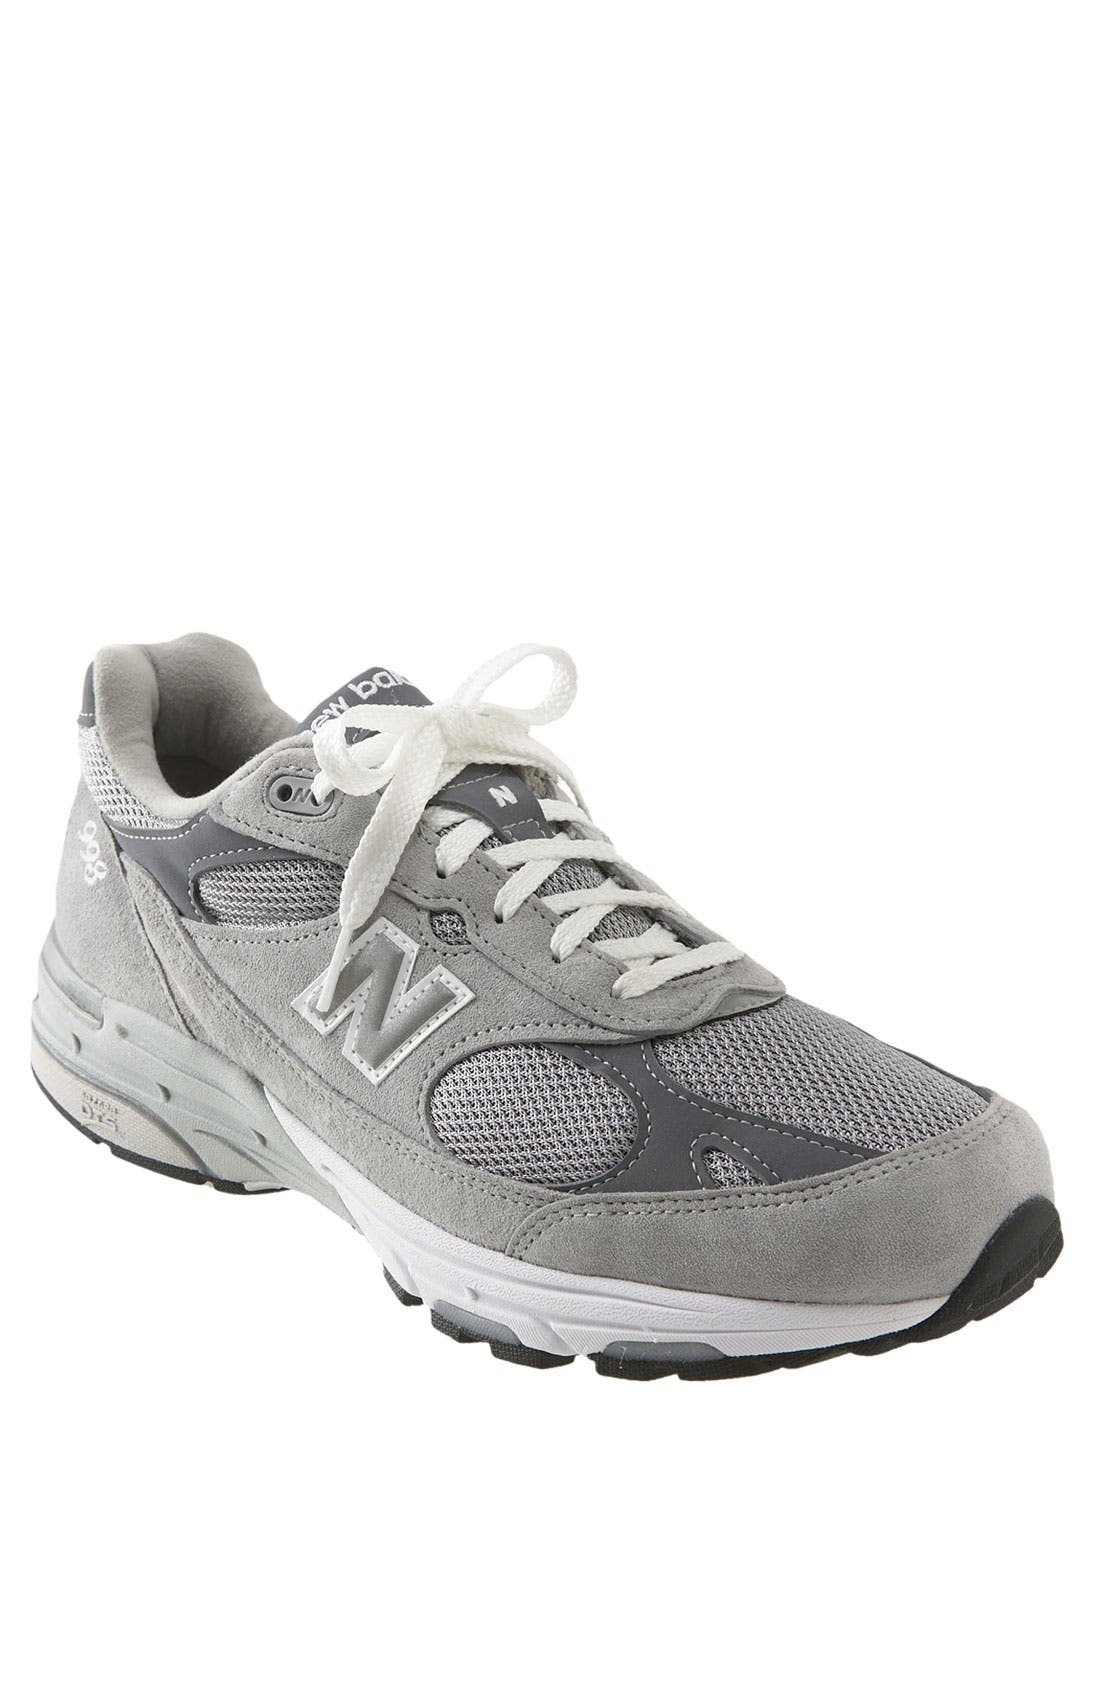 '993' Running Shoe,                             Main thumbnail 1, color,                             Grey